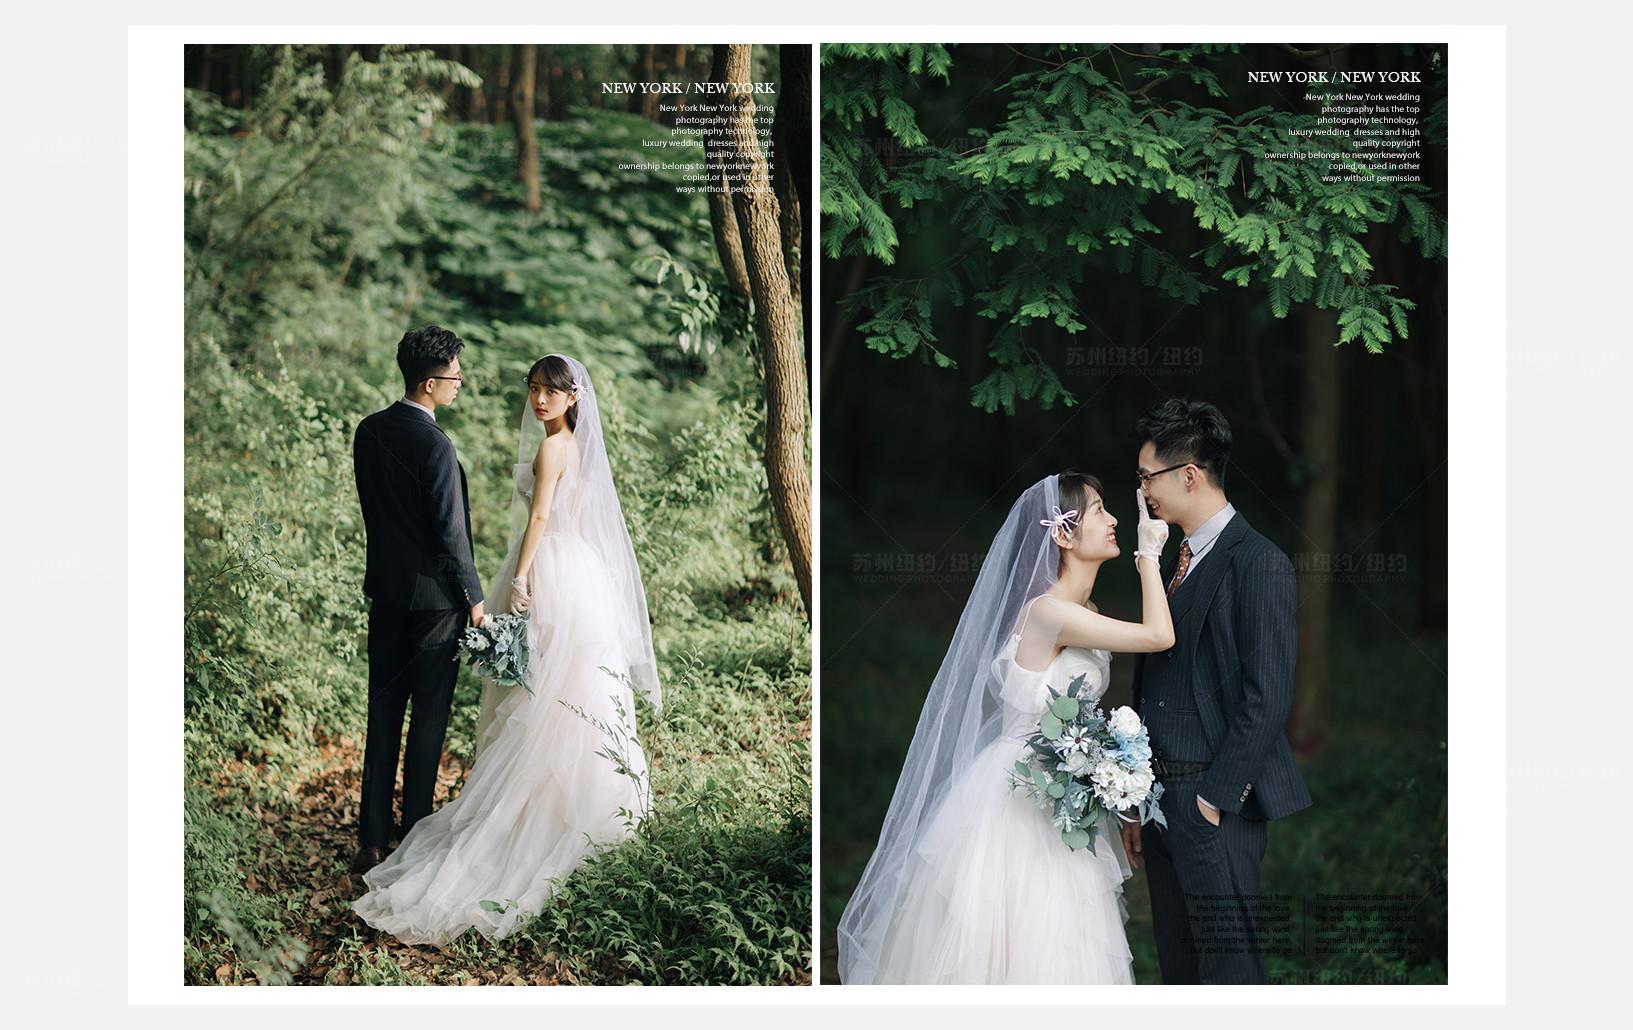 Mr.顾 & Ms.徐(纽约纽约最新客照)婚纱摄影照